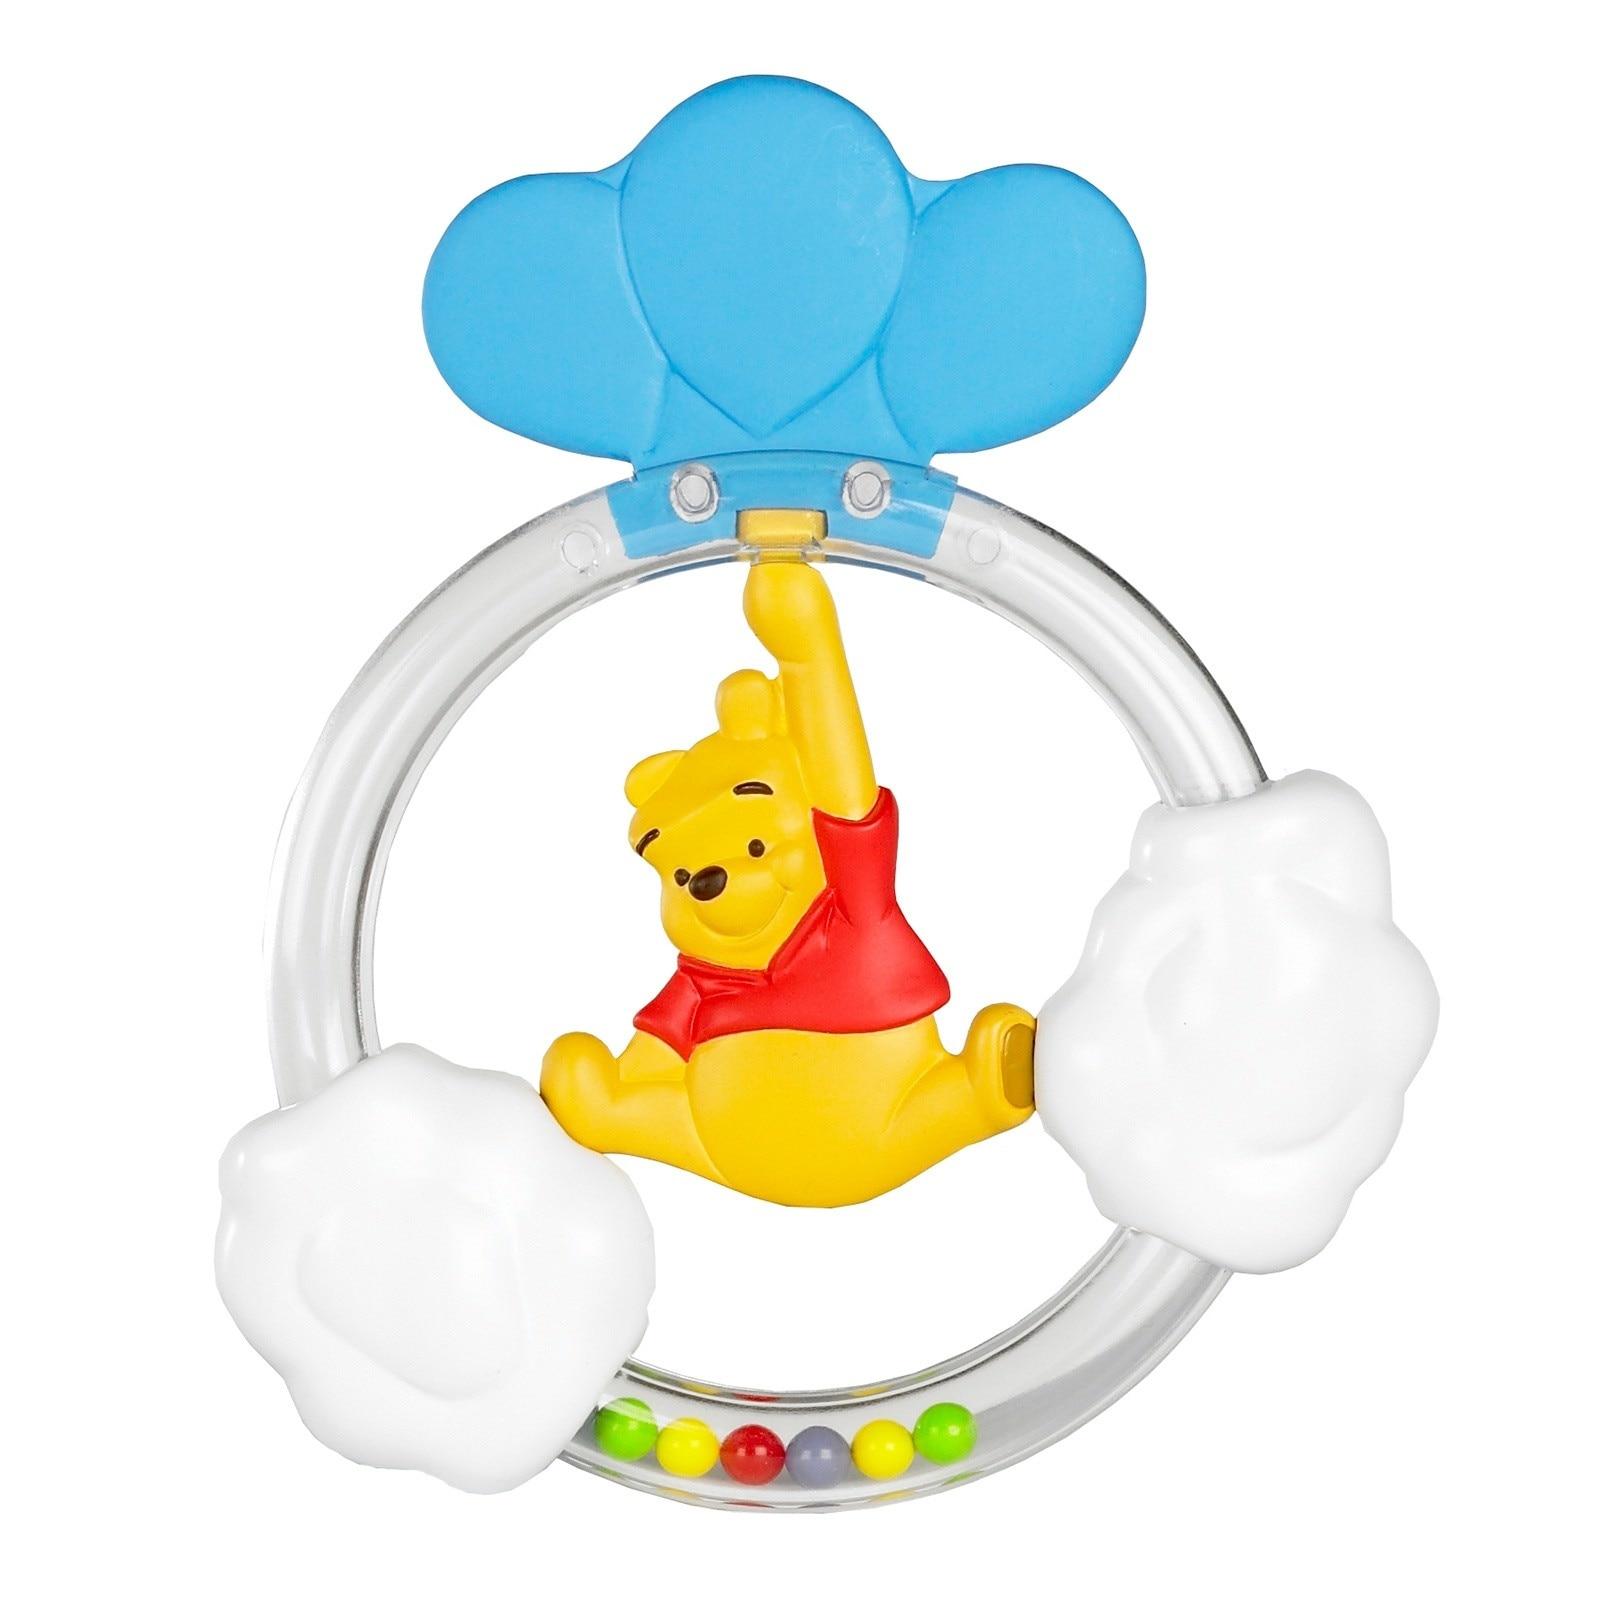 Ebebek Tomy Winnie The Pooh & Tigger Teether Rattle